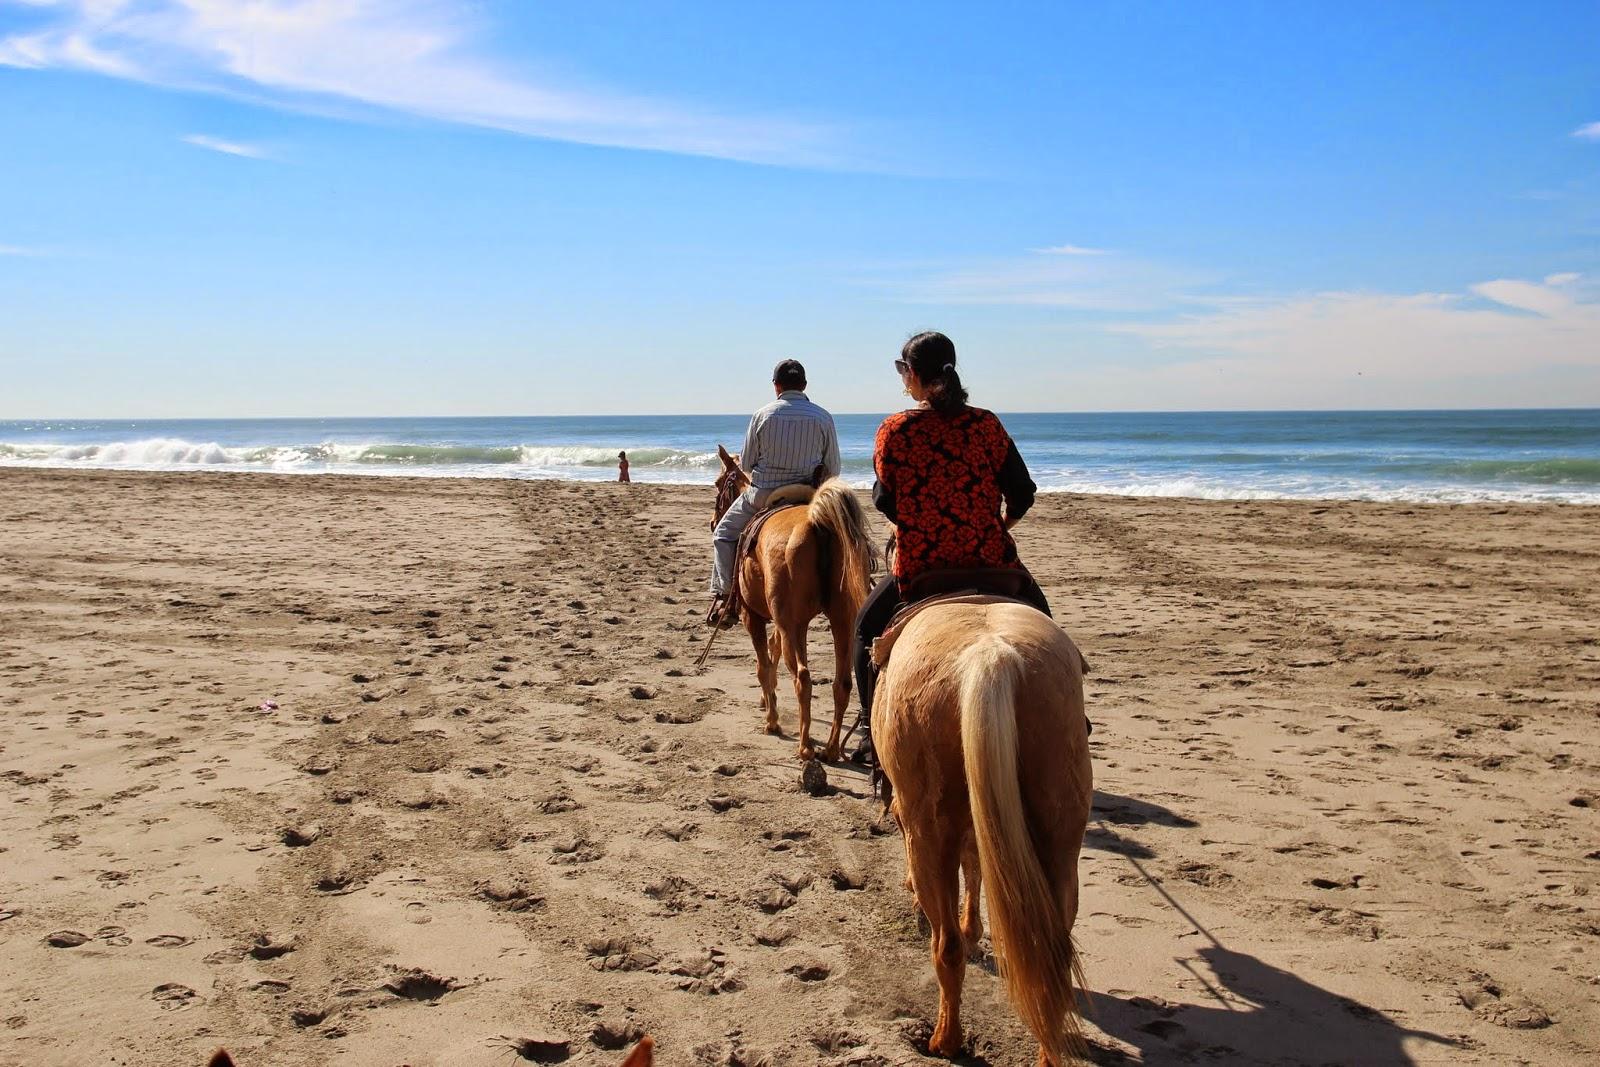 Horseback Riding San Francisco Beach The Best Beaches In World